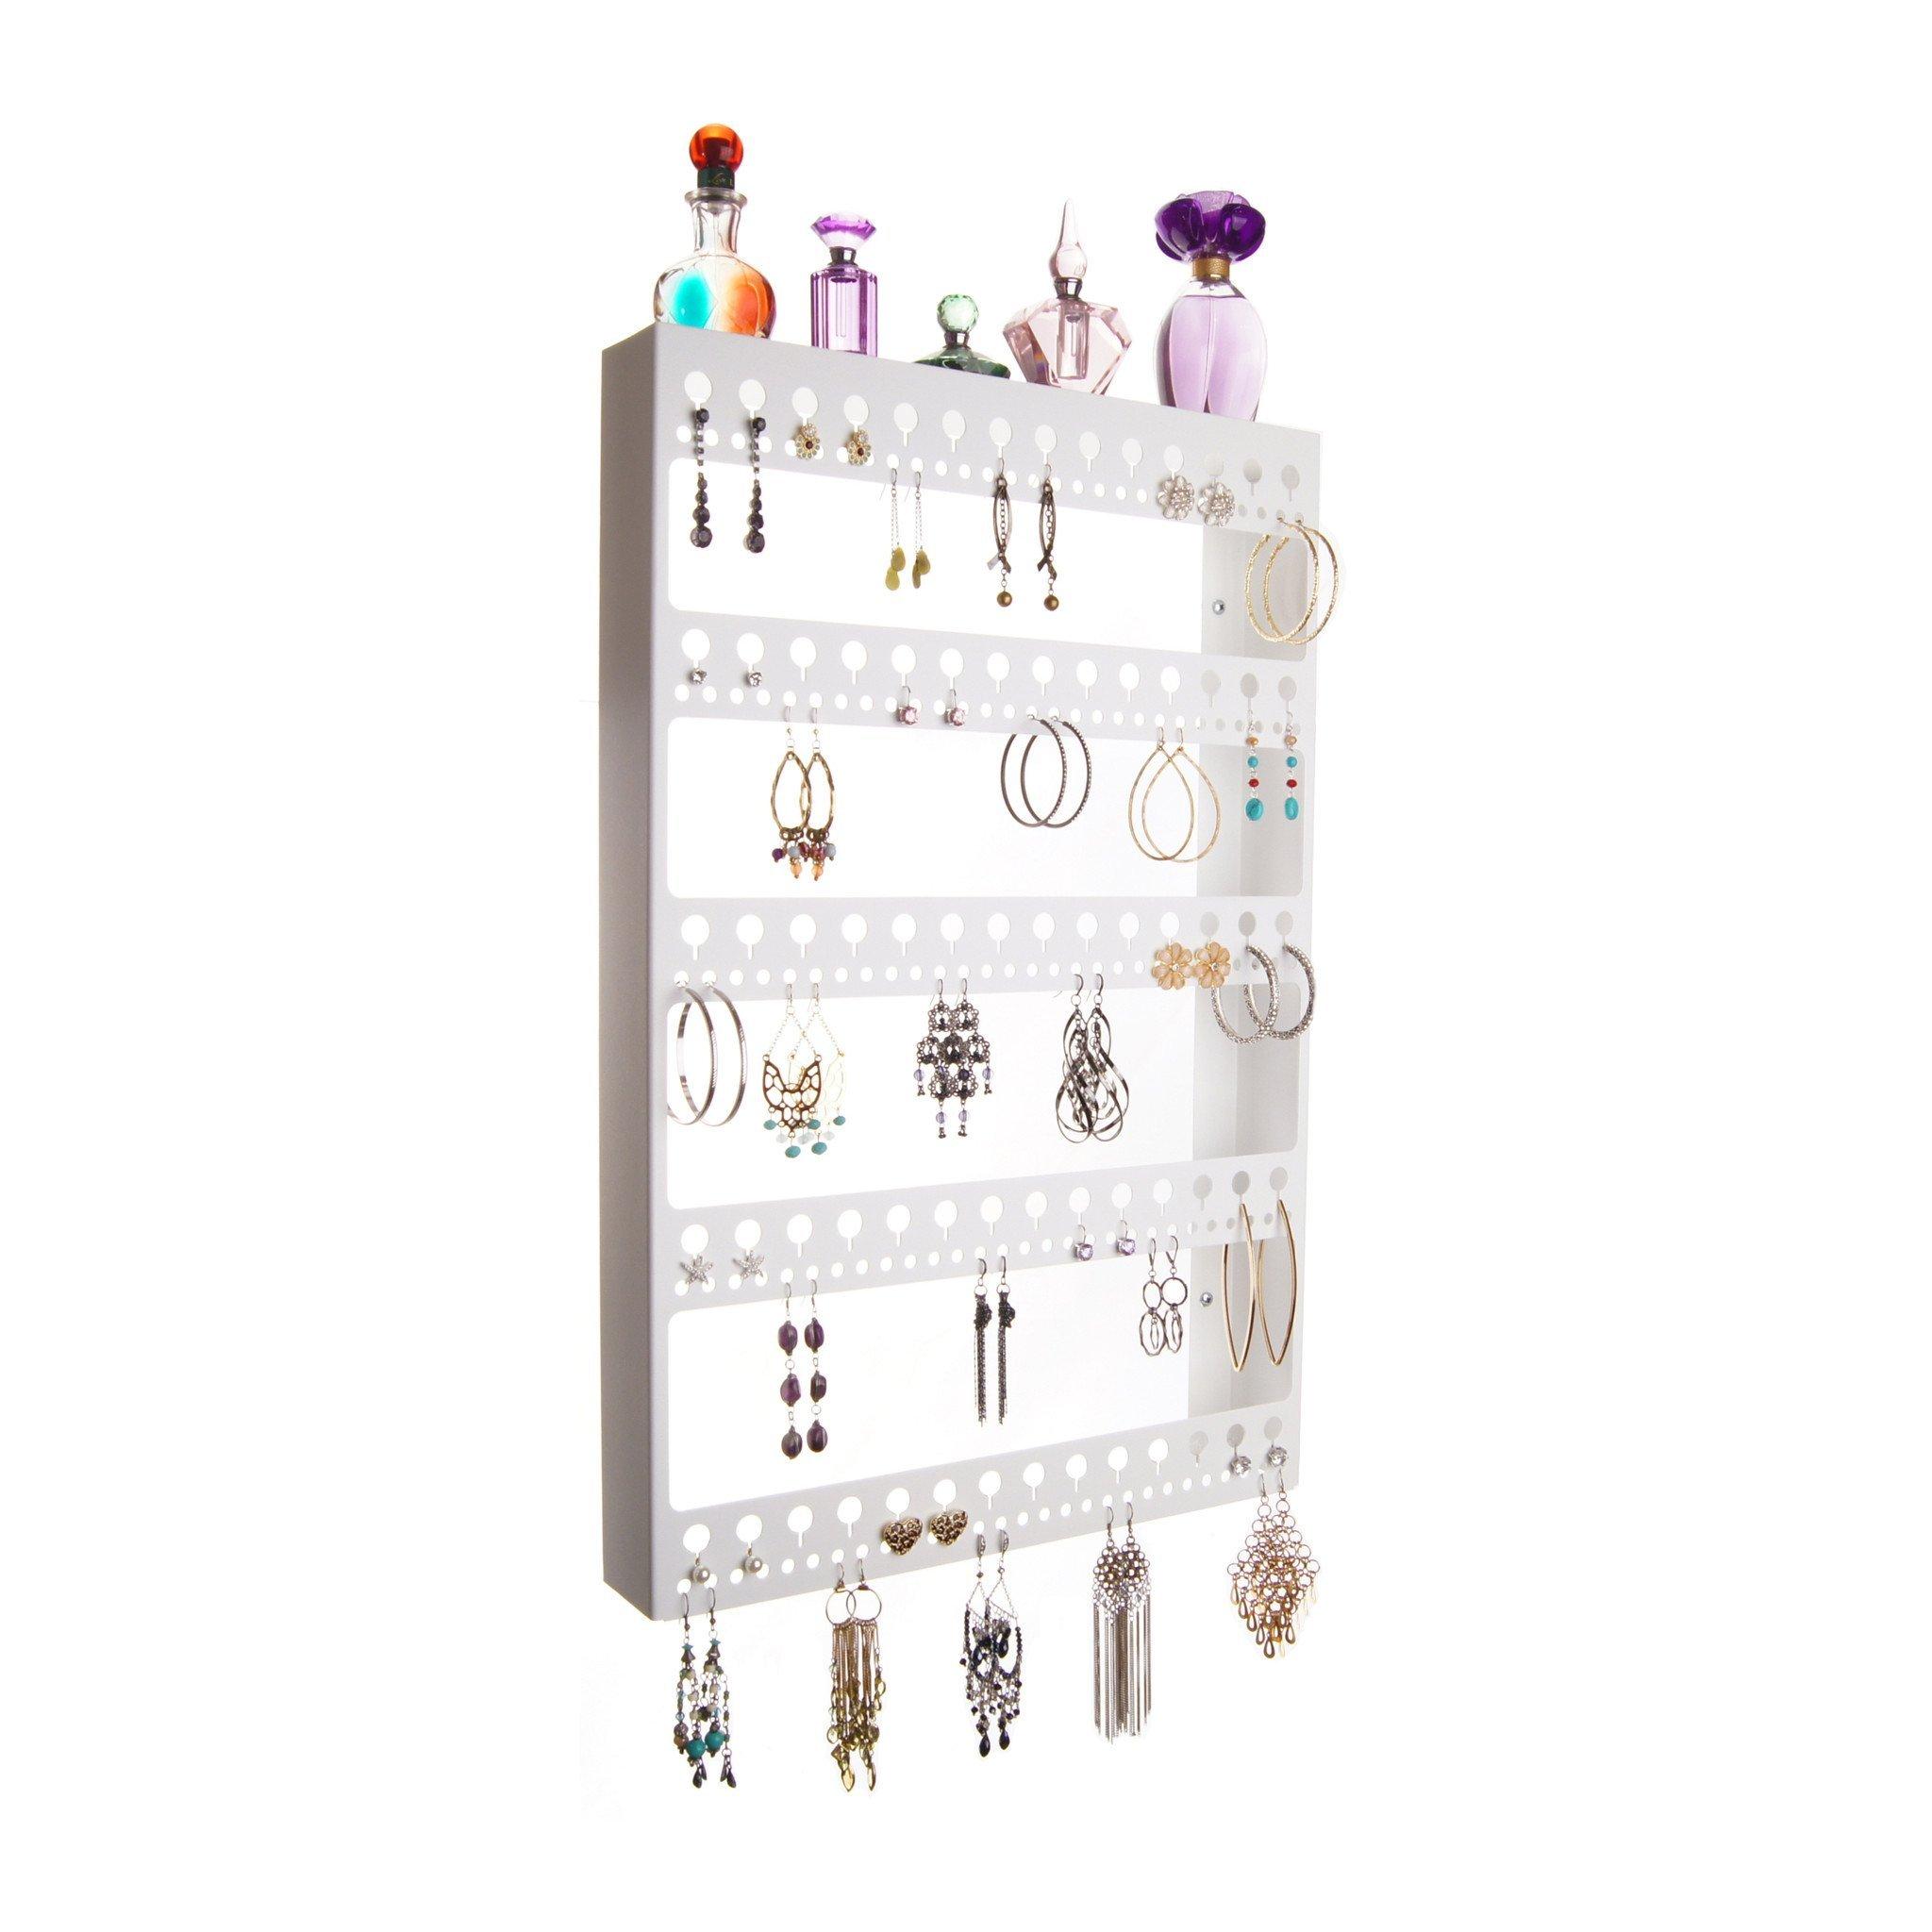 Earring Holder Organizer Wall Mount Jewelry Organizer Hanging Closet Storage Rack with Shelf, Nichole White by Angelynn's Jewelry Organizers (Image #1)